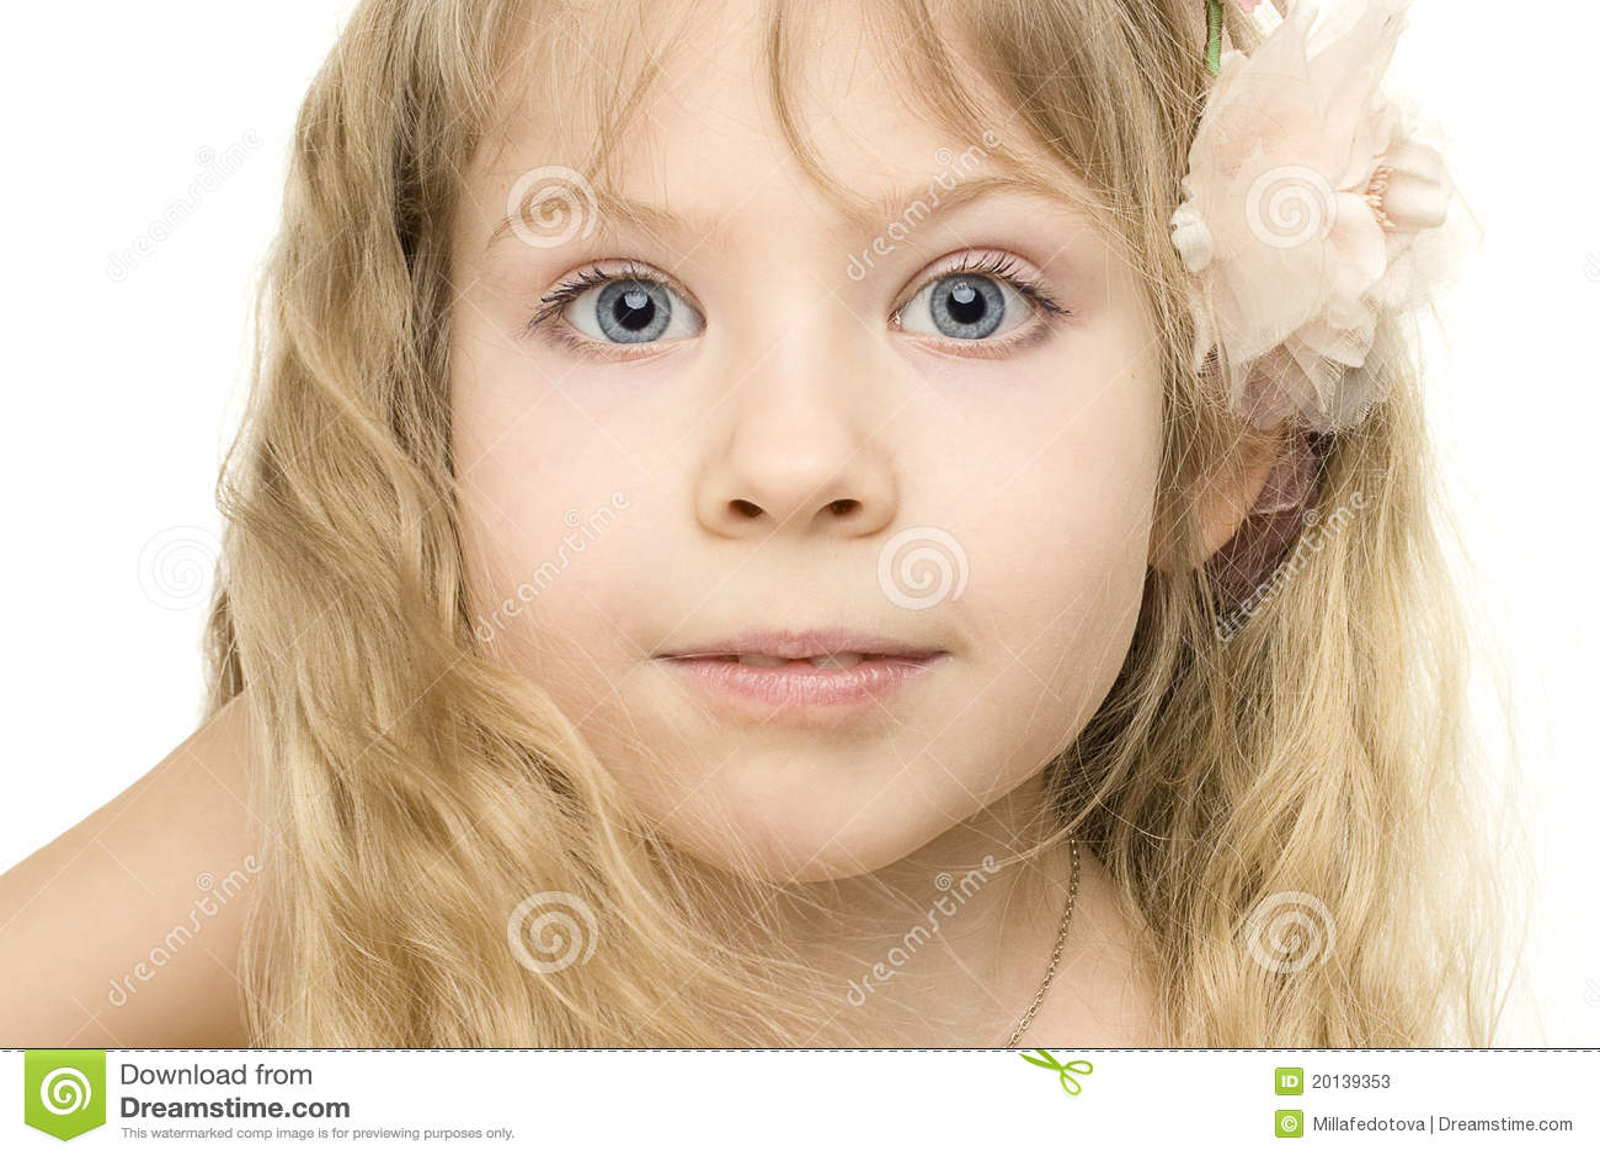 Girls face close up